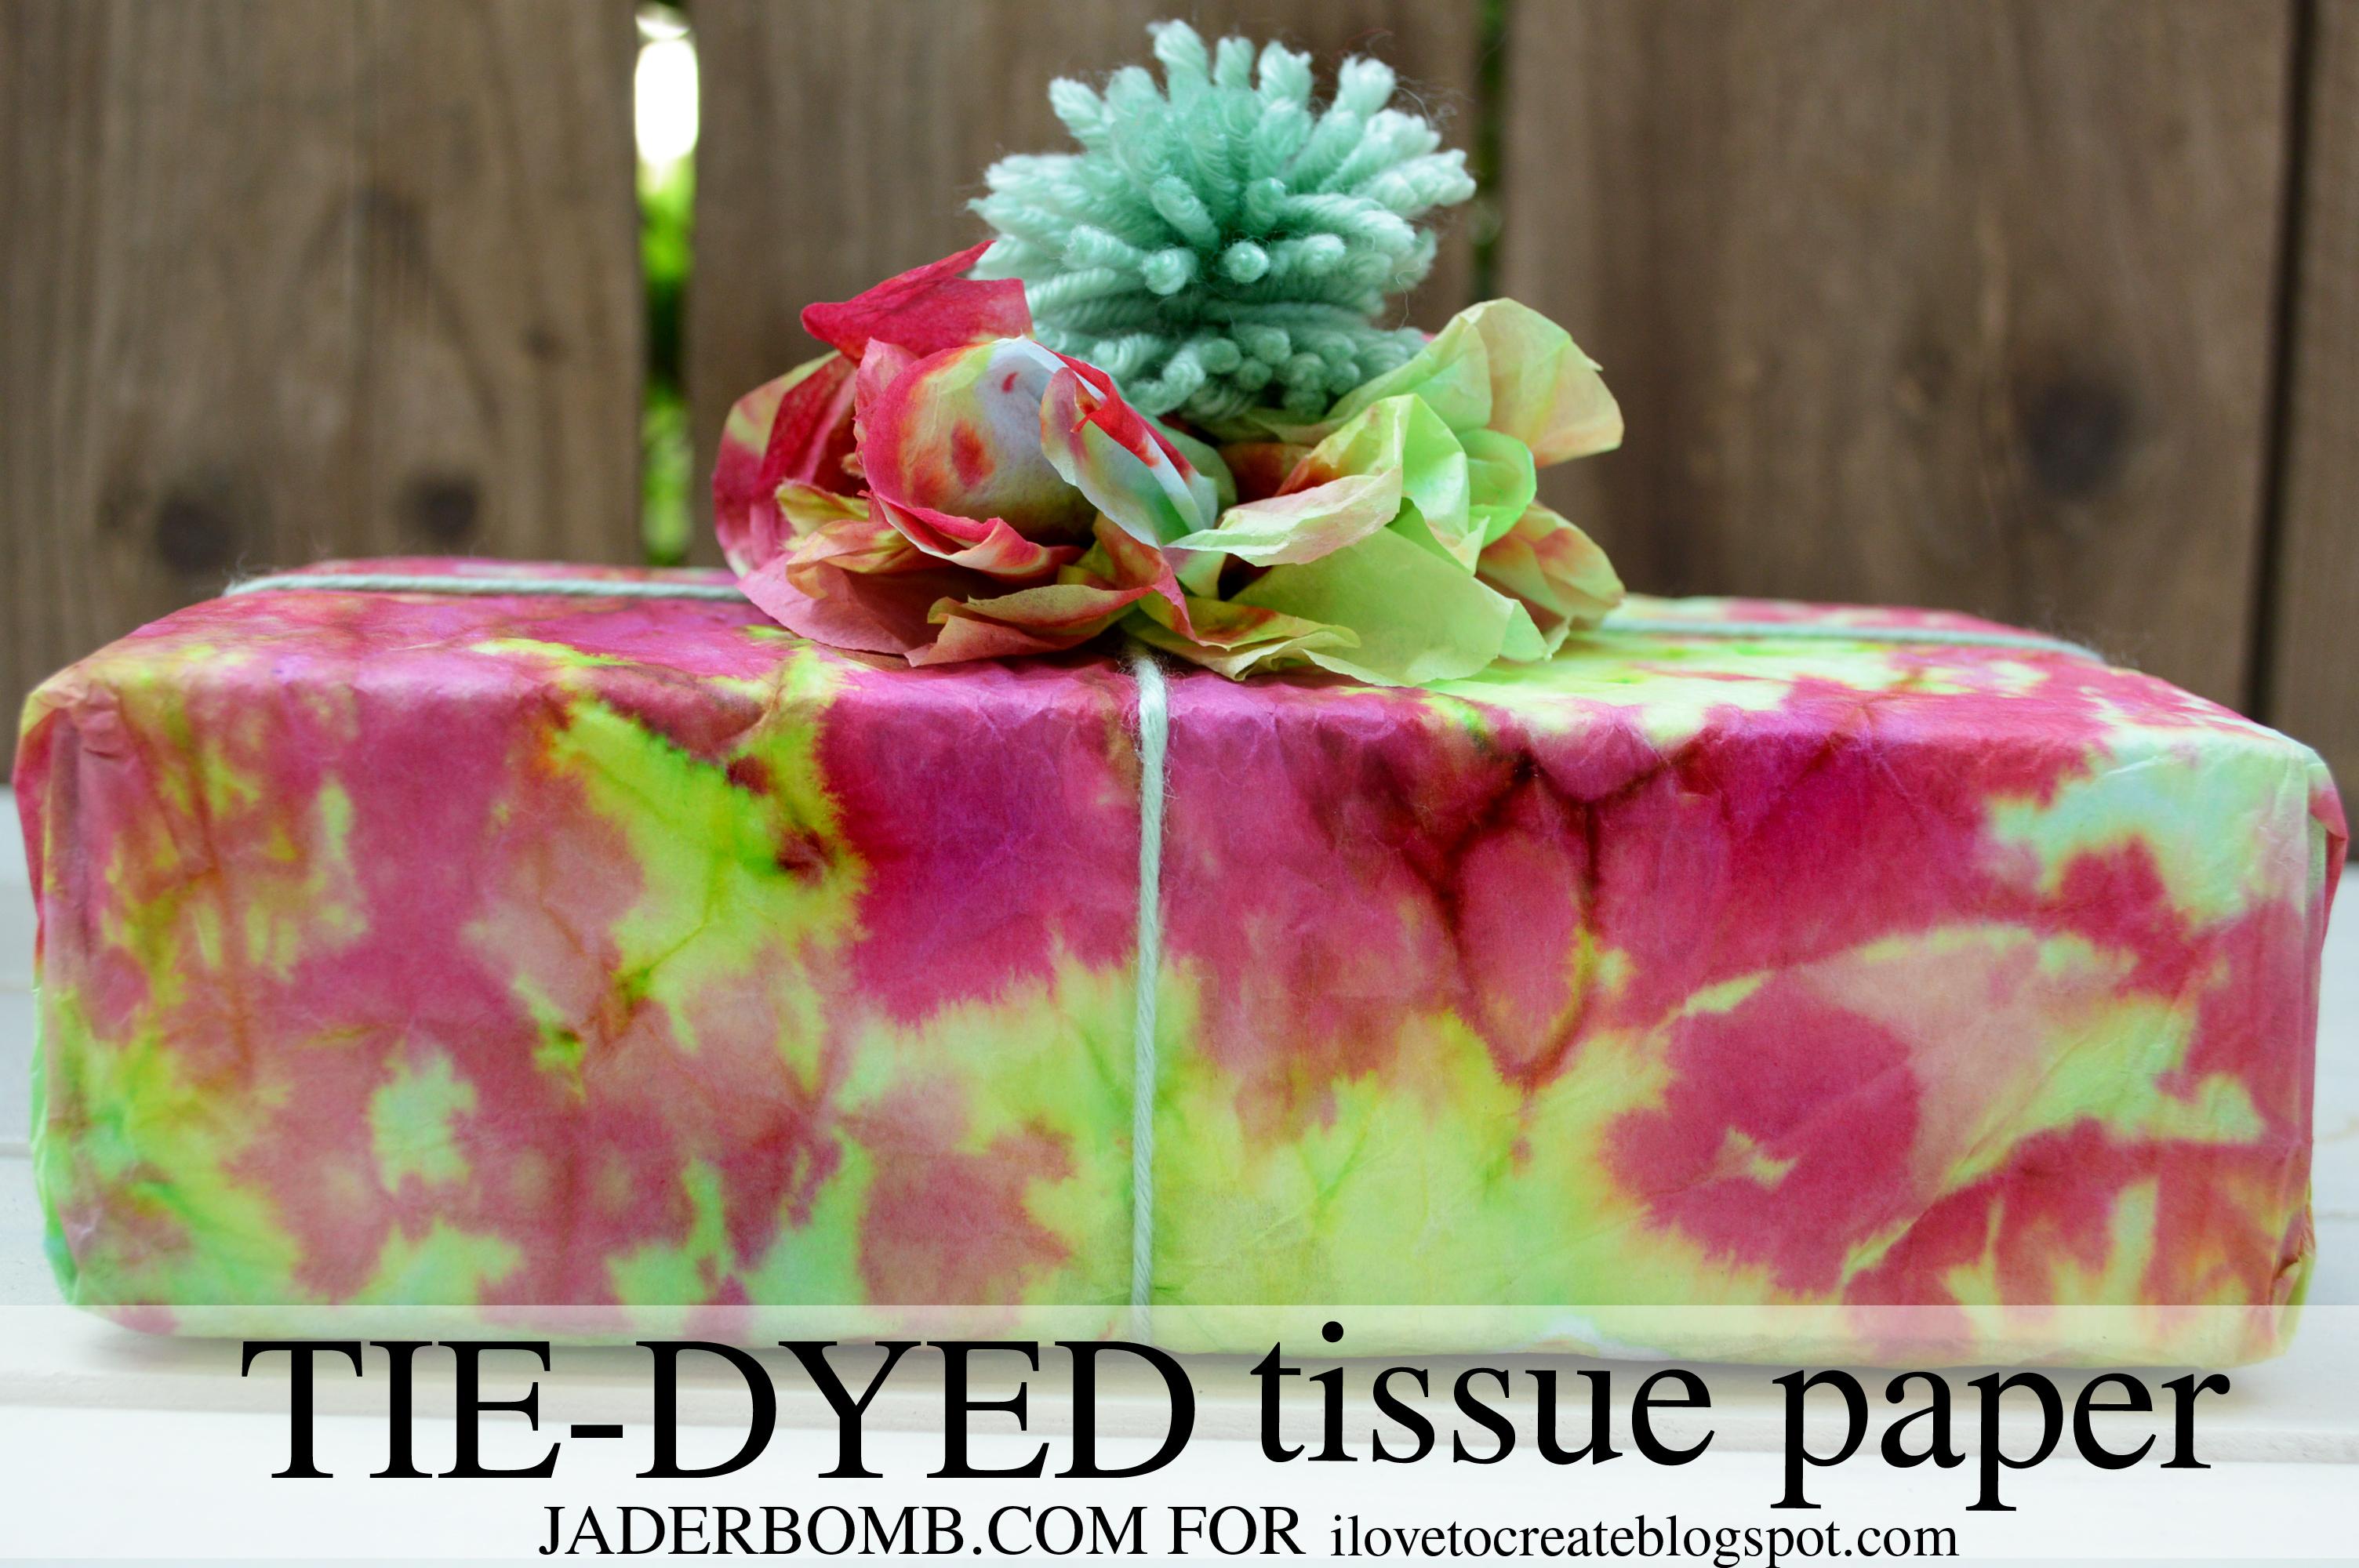 tie dyed tissue paper tutorial jaderbomb. Black Bedroom Furniture Sets. Home Design Ideas